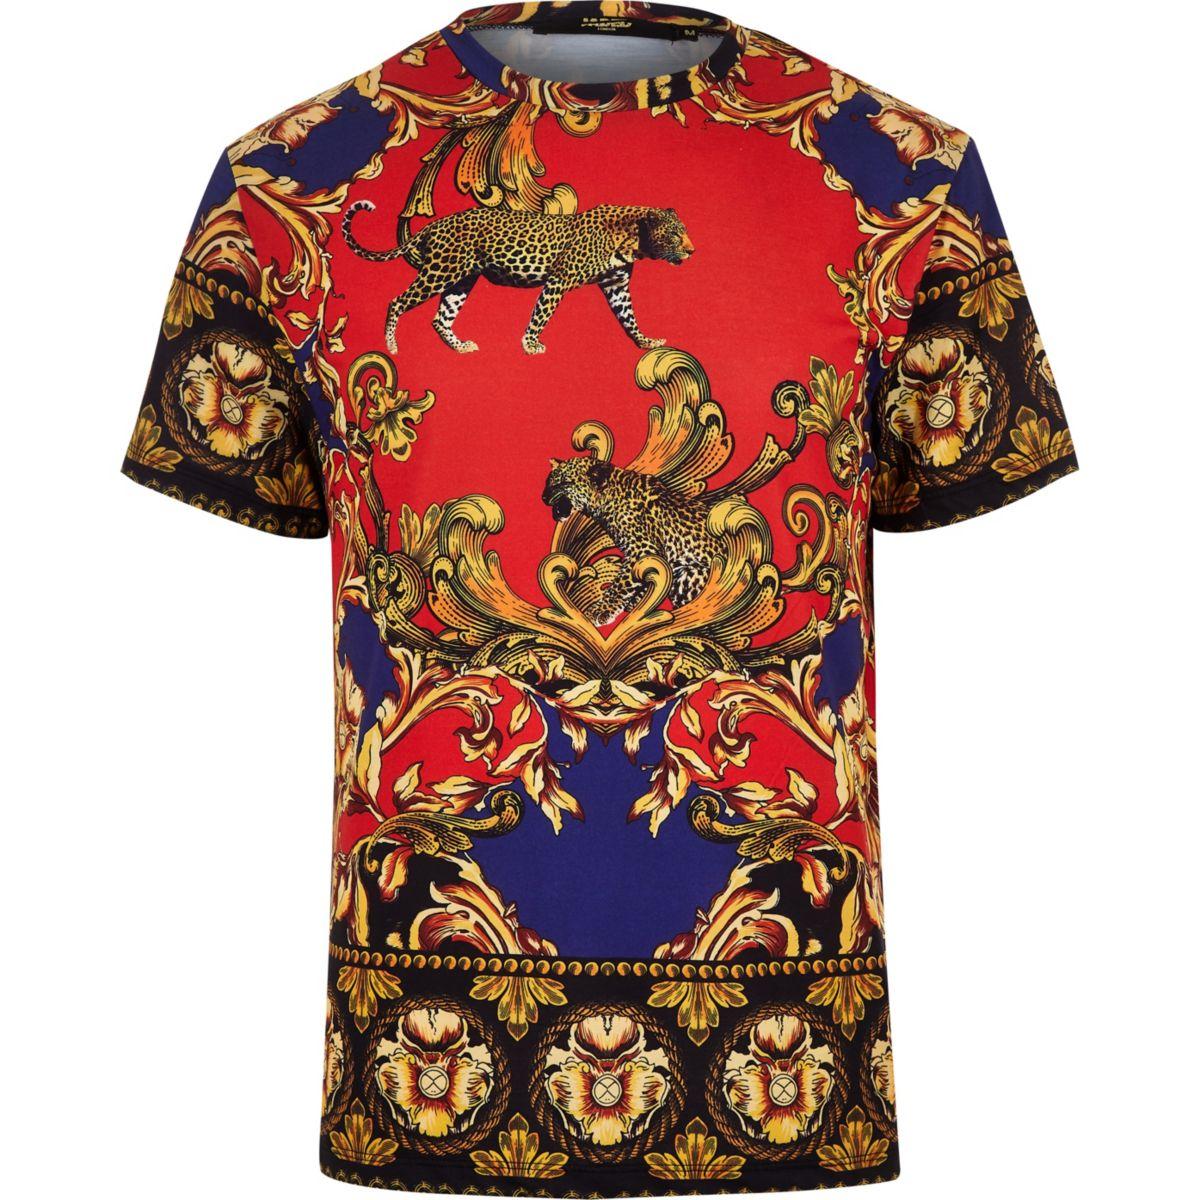 Jaded black baroque print T-shirt